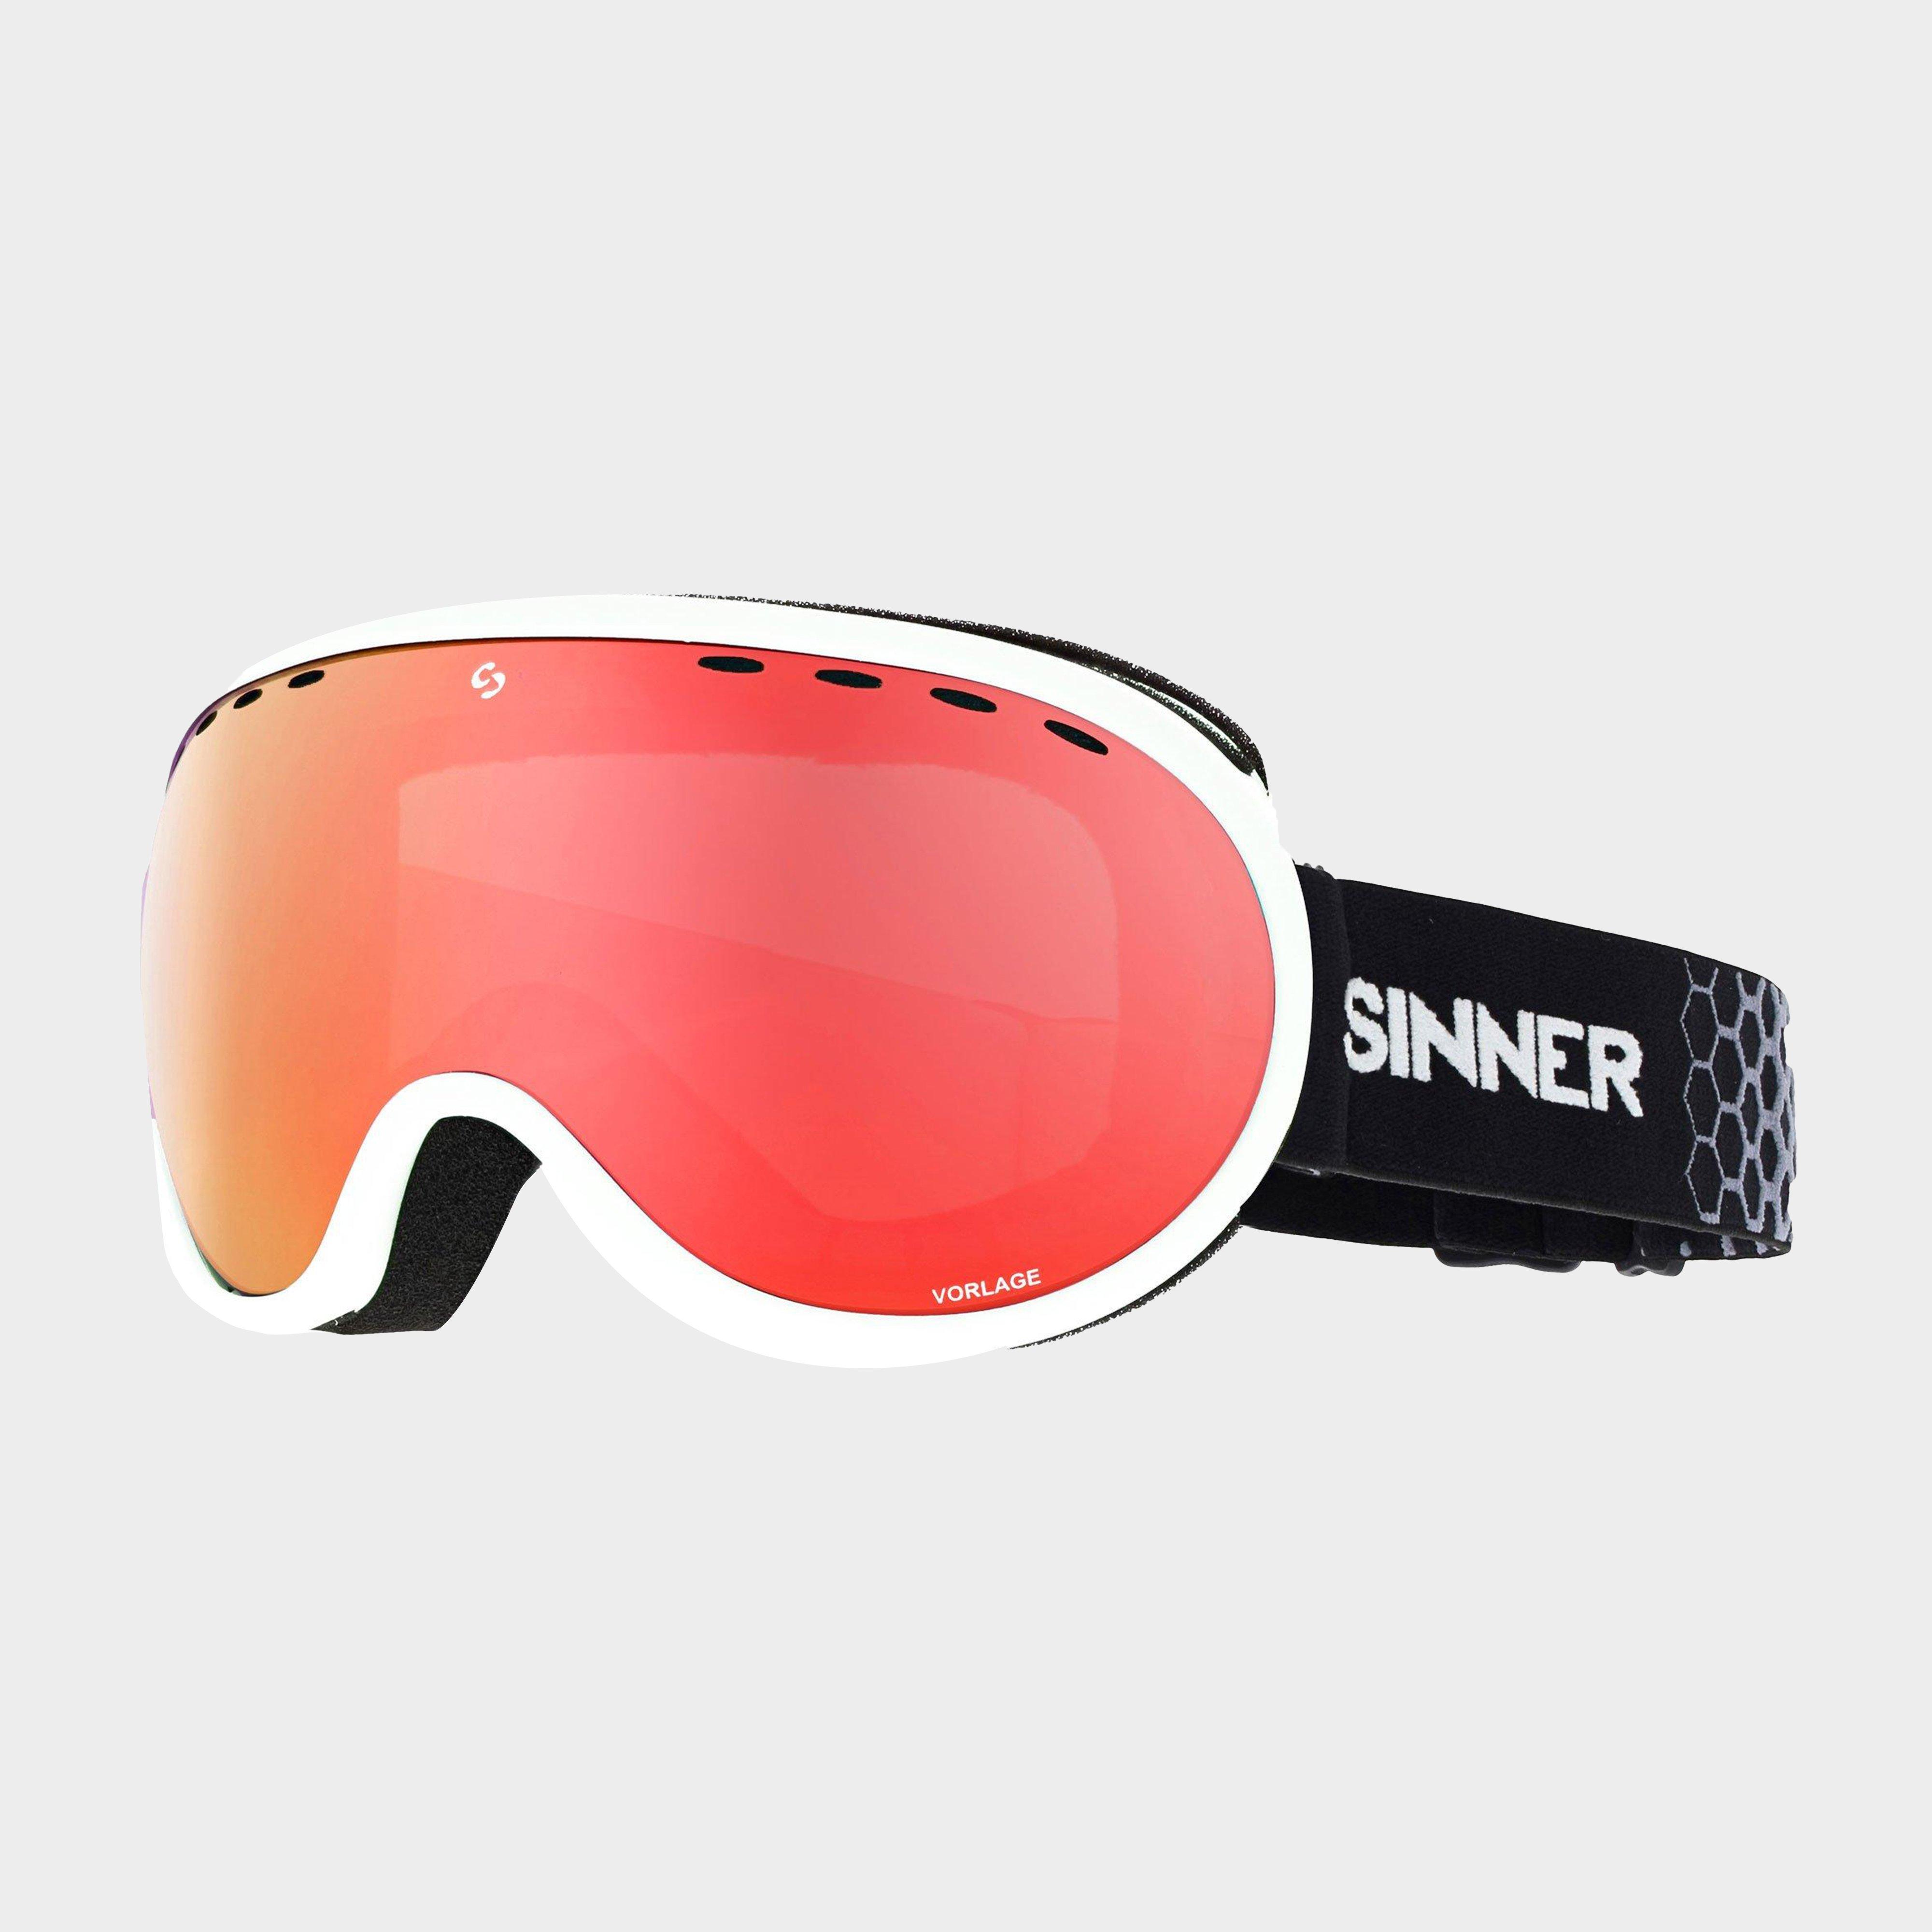 Image of Sinner Vorlage Goggles - White/Red, White/RED